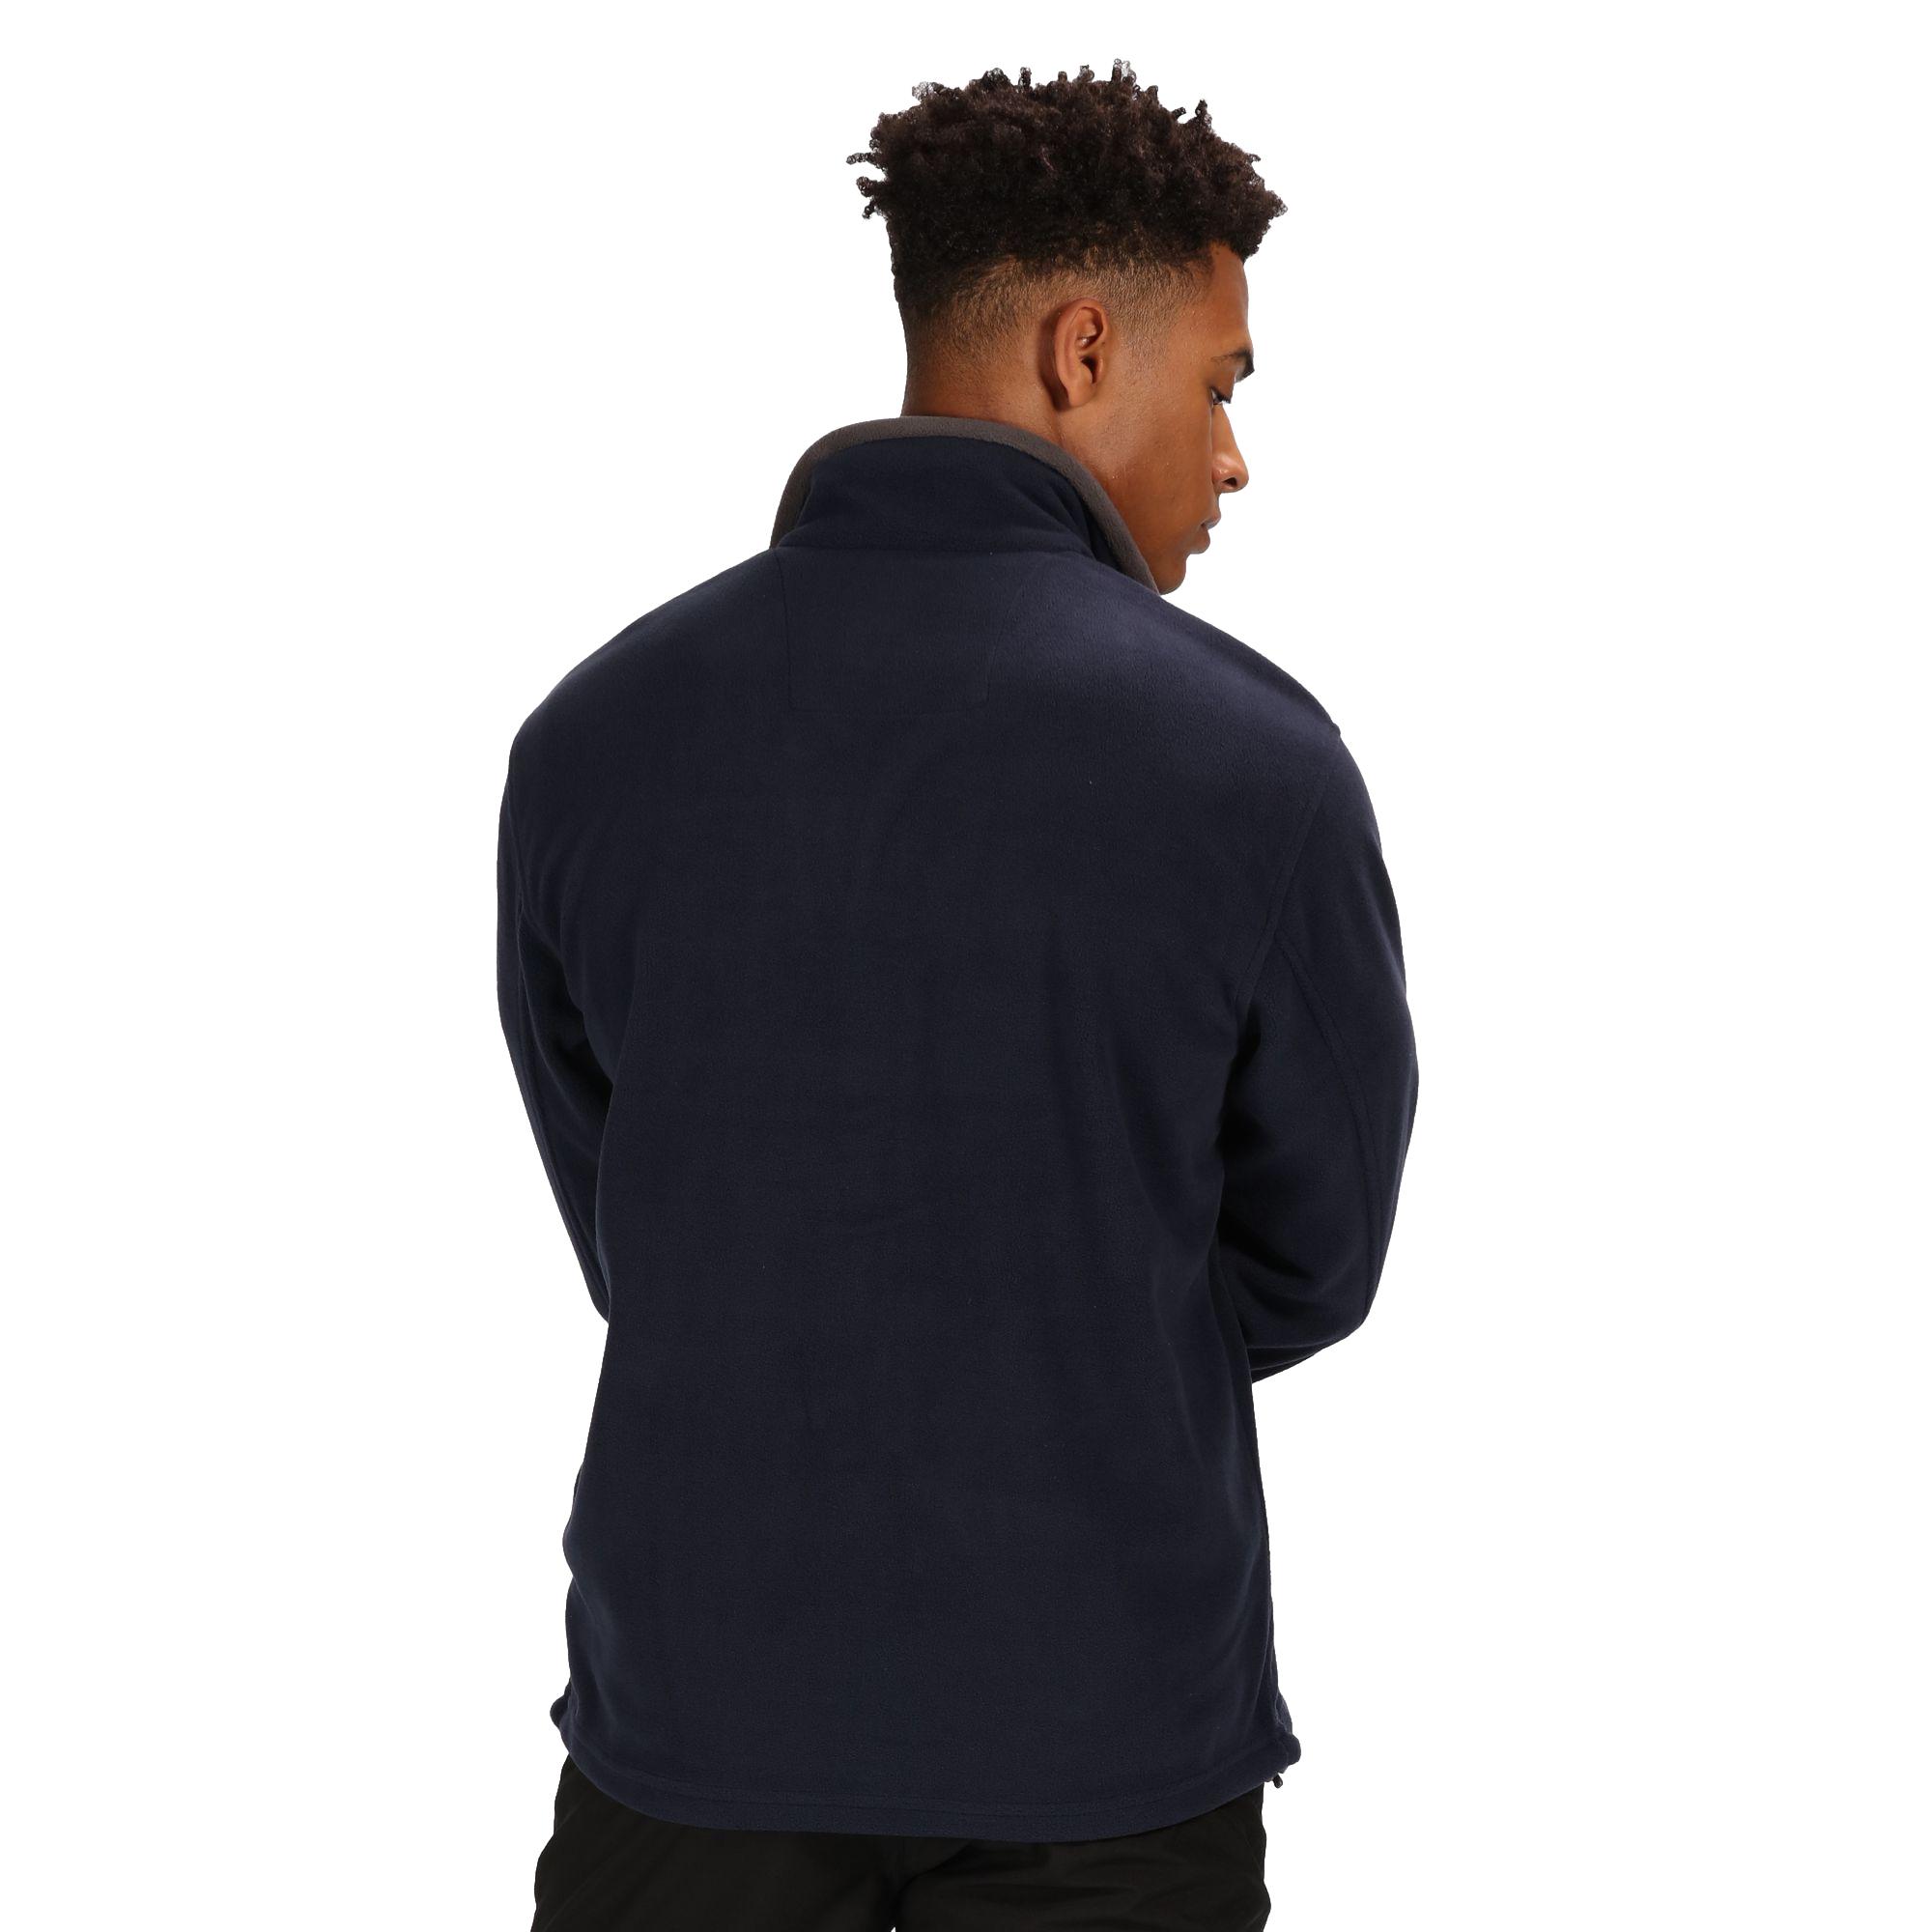 thumbnail 12 - Regatta Fellard Mens Lightweight Full Zip Warm Walking Fleece Jacket RRP £30